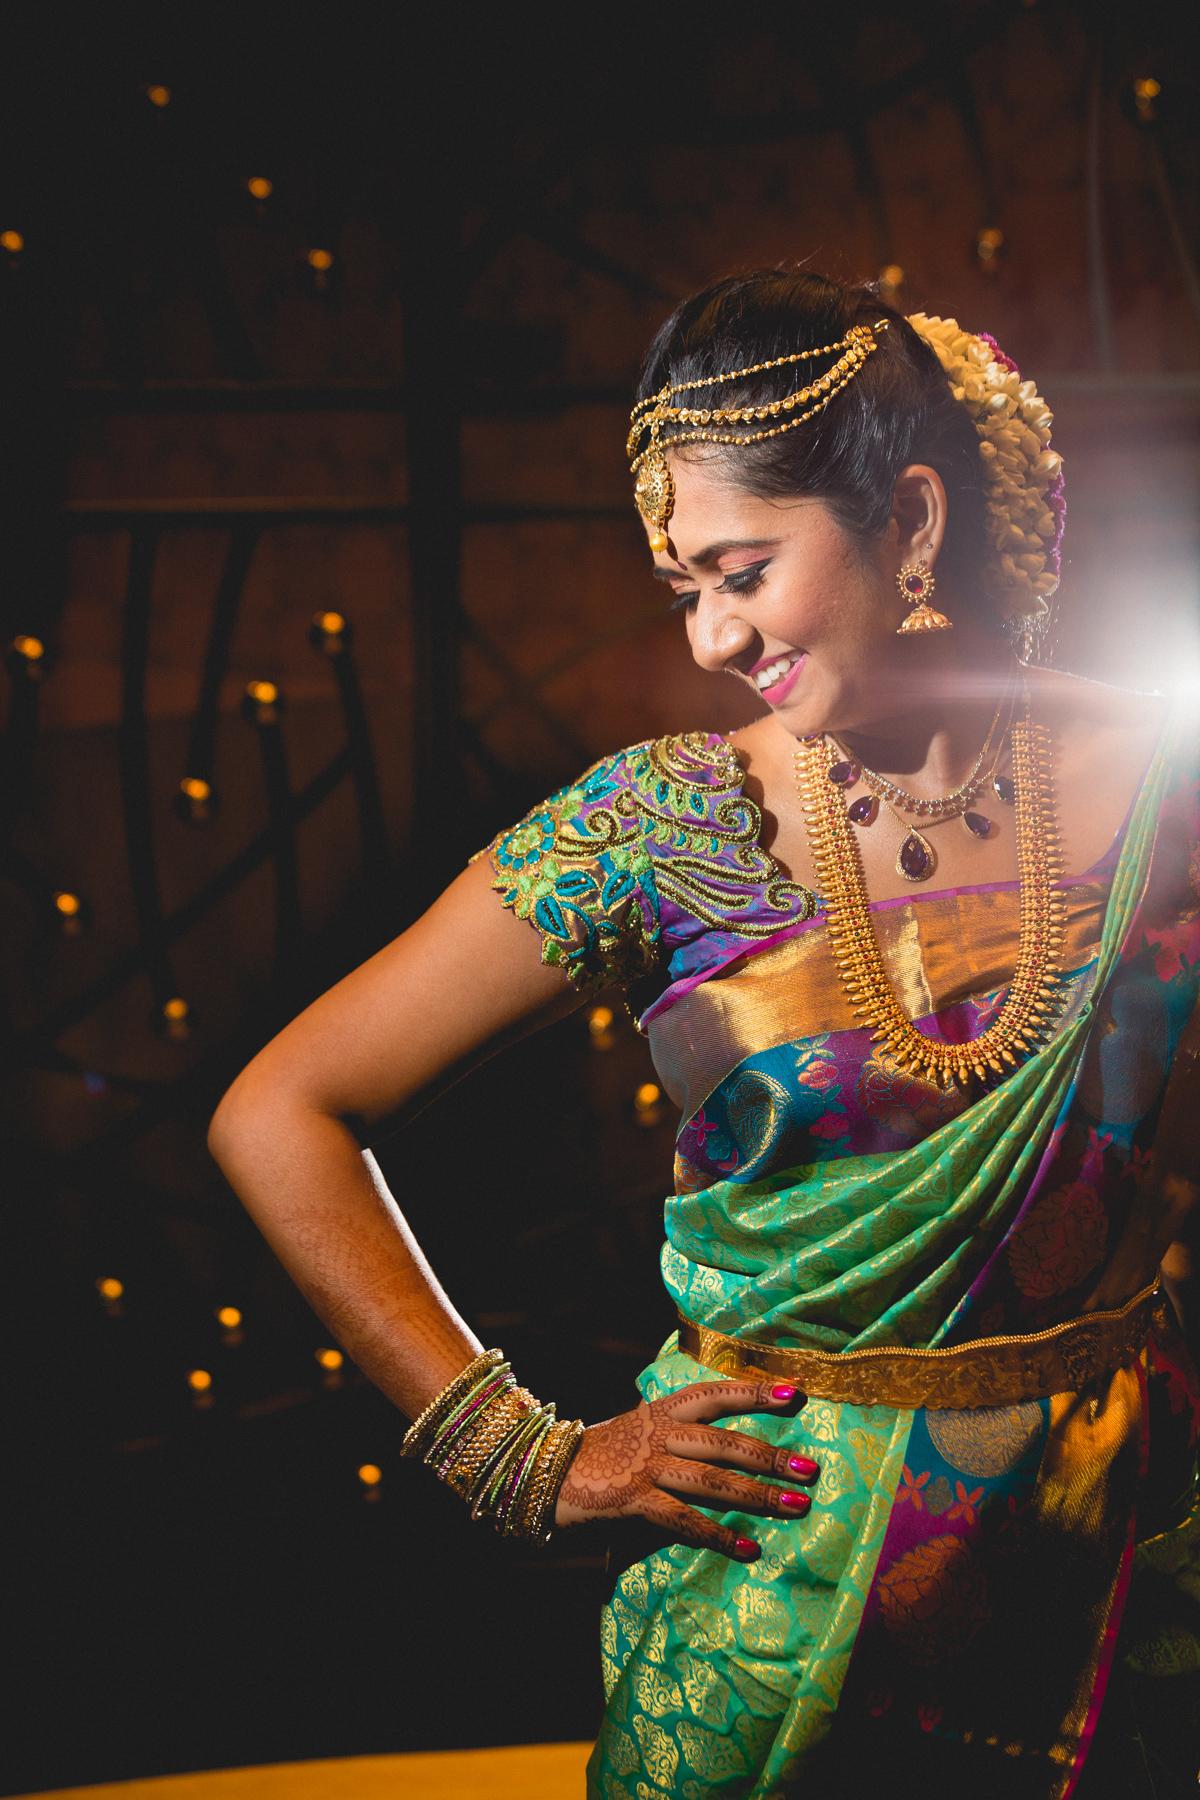 edward-b-photography-indian-wedding-37.jpg